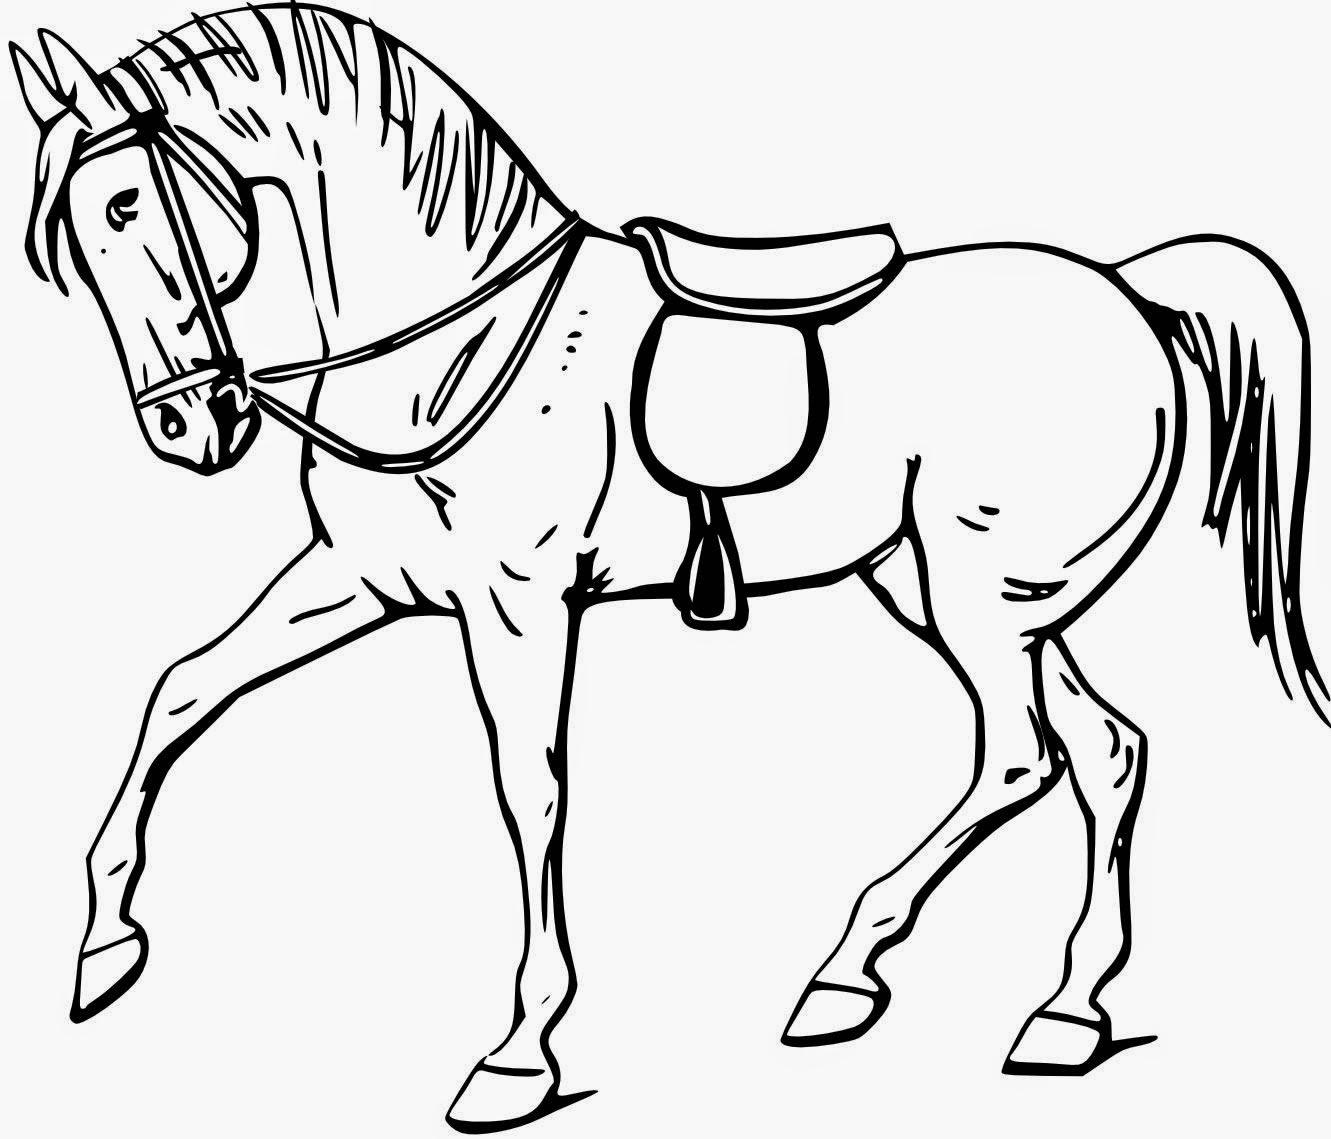 Worksheet. La Chachipedia Dibujos de caballos para colorear